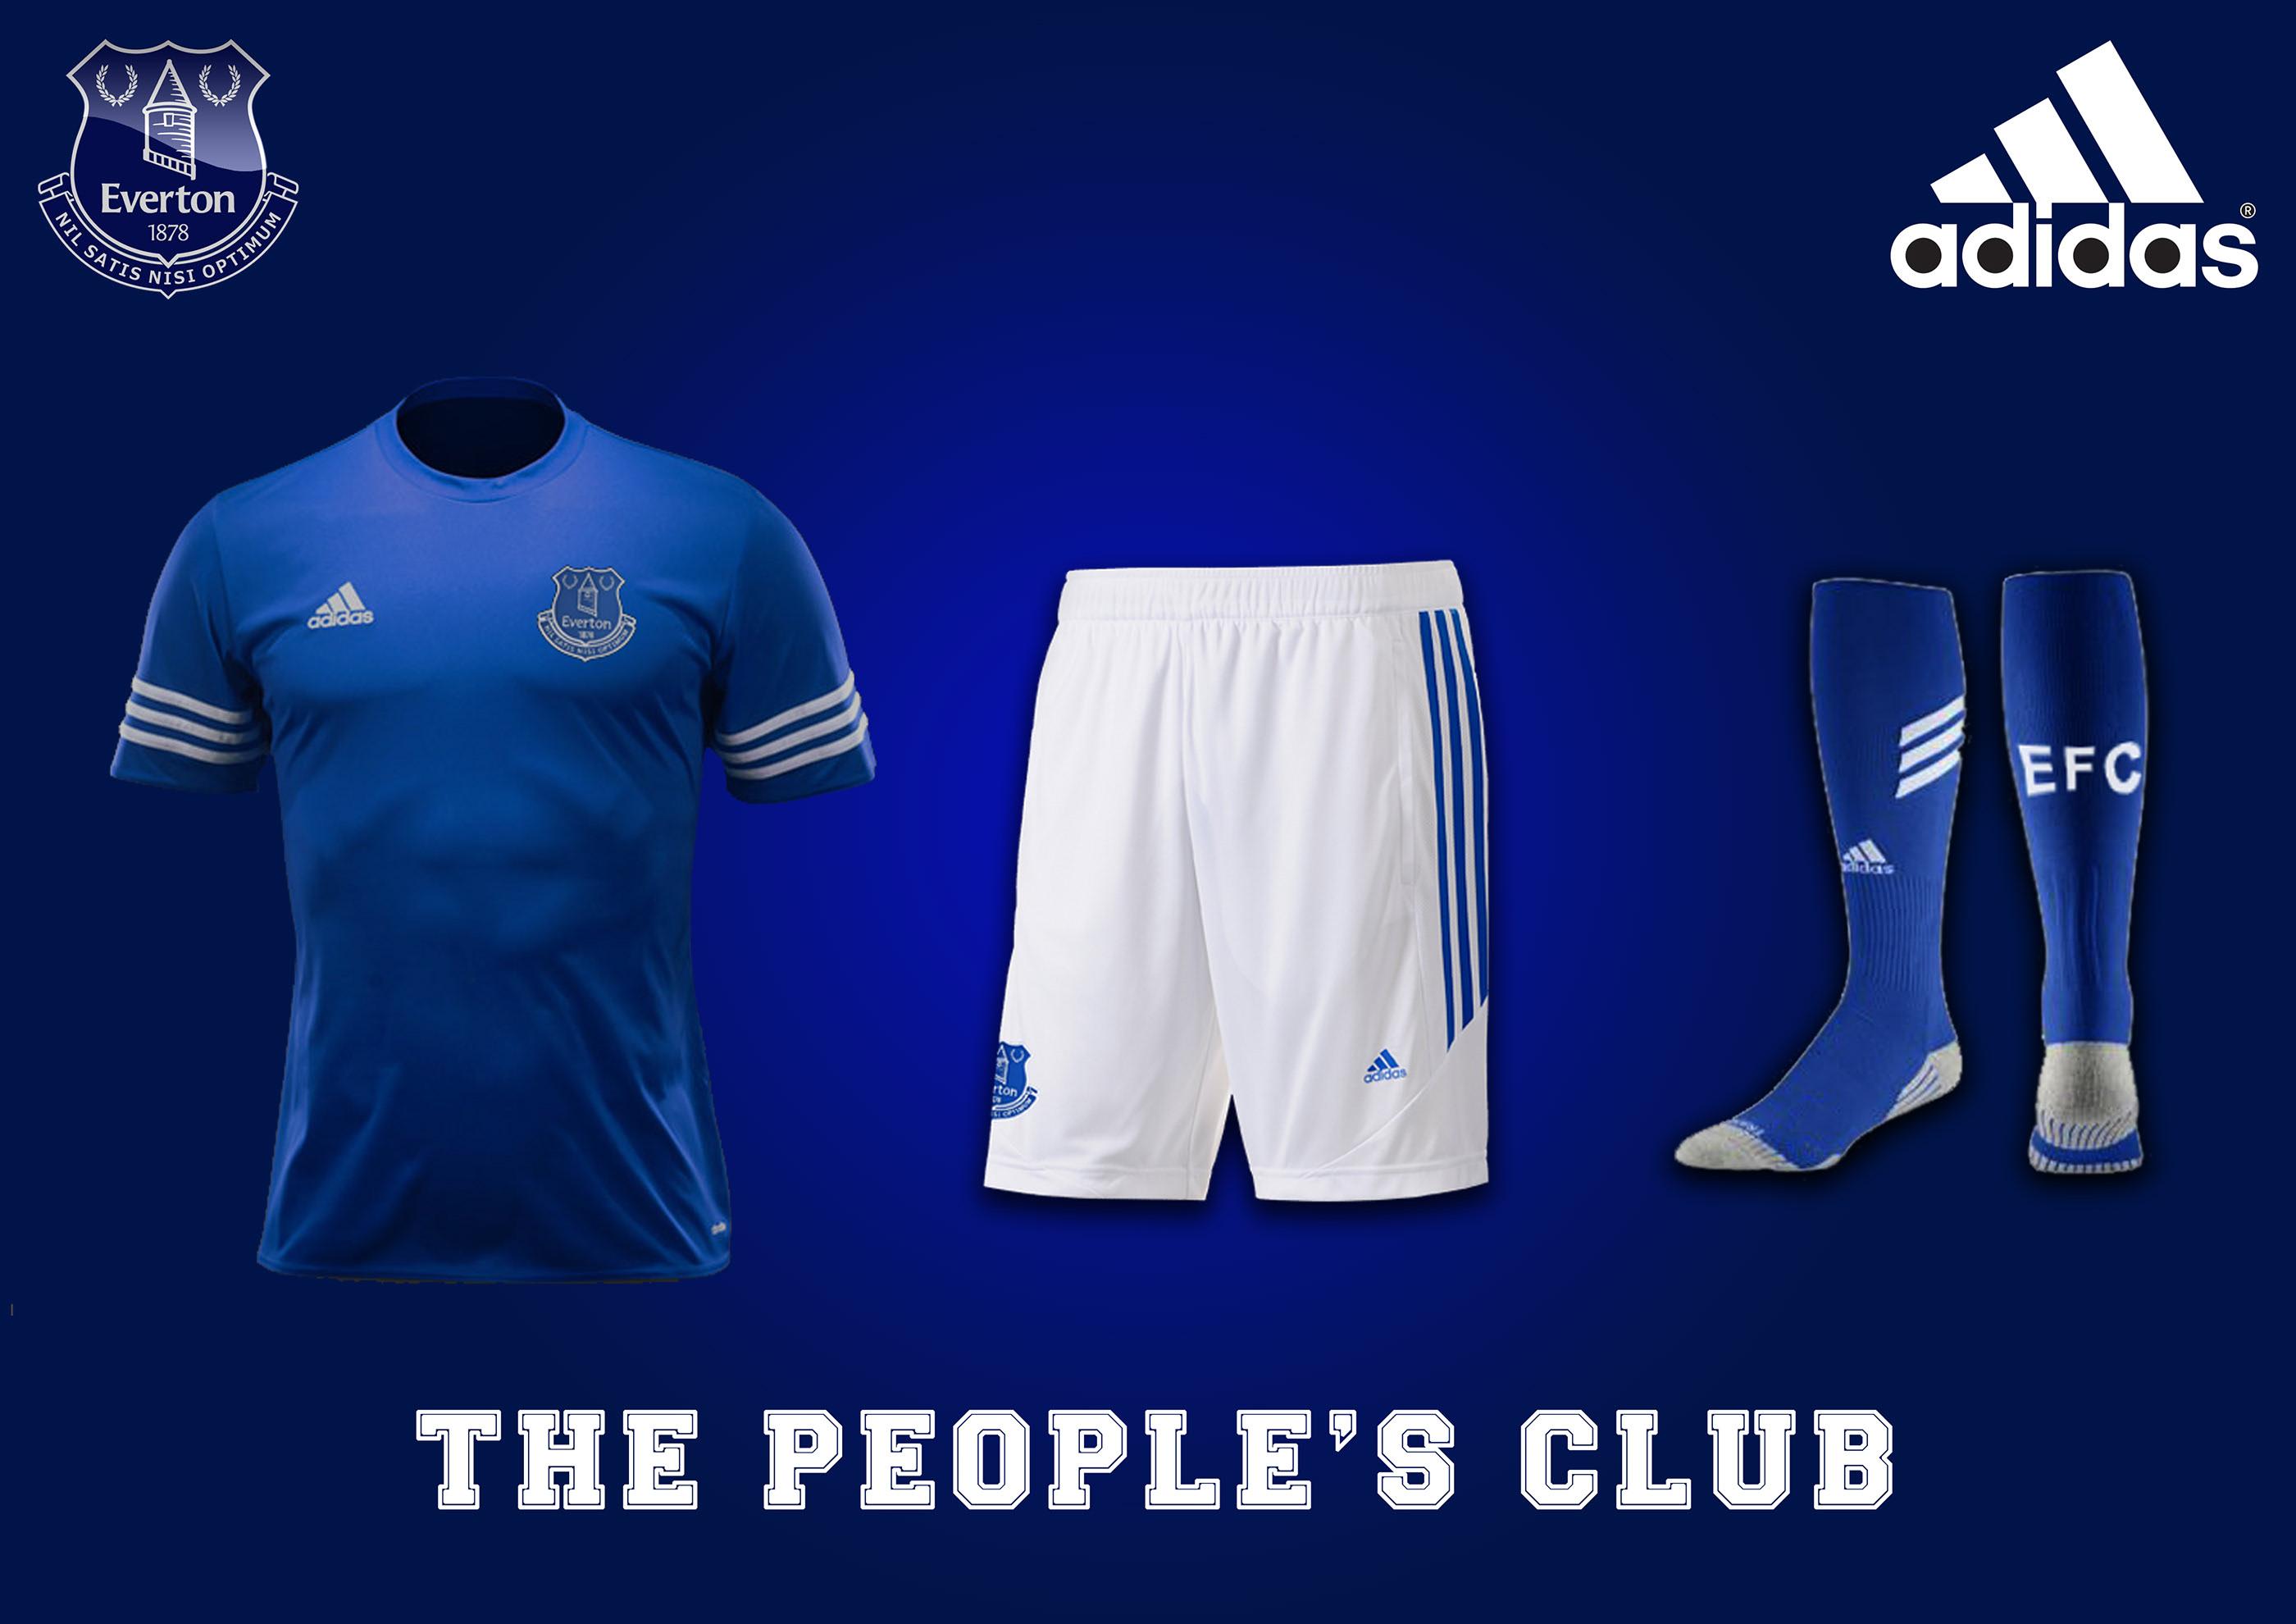 reputable site aed86 54531 Everton Football Club - Adidas sponsor on Behance